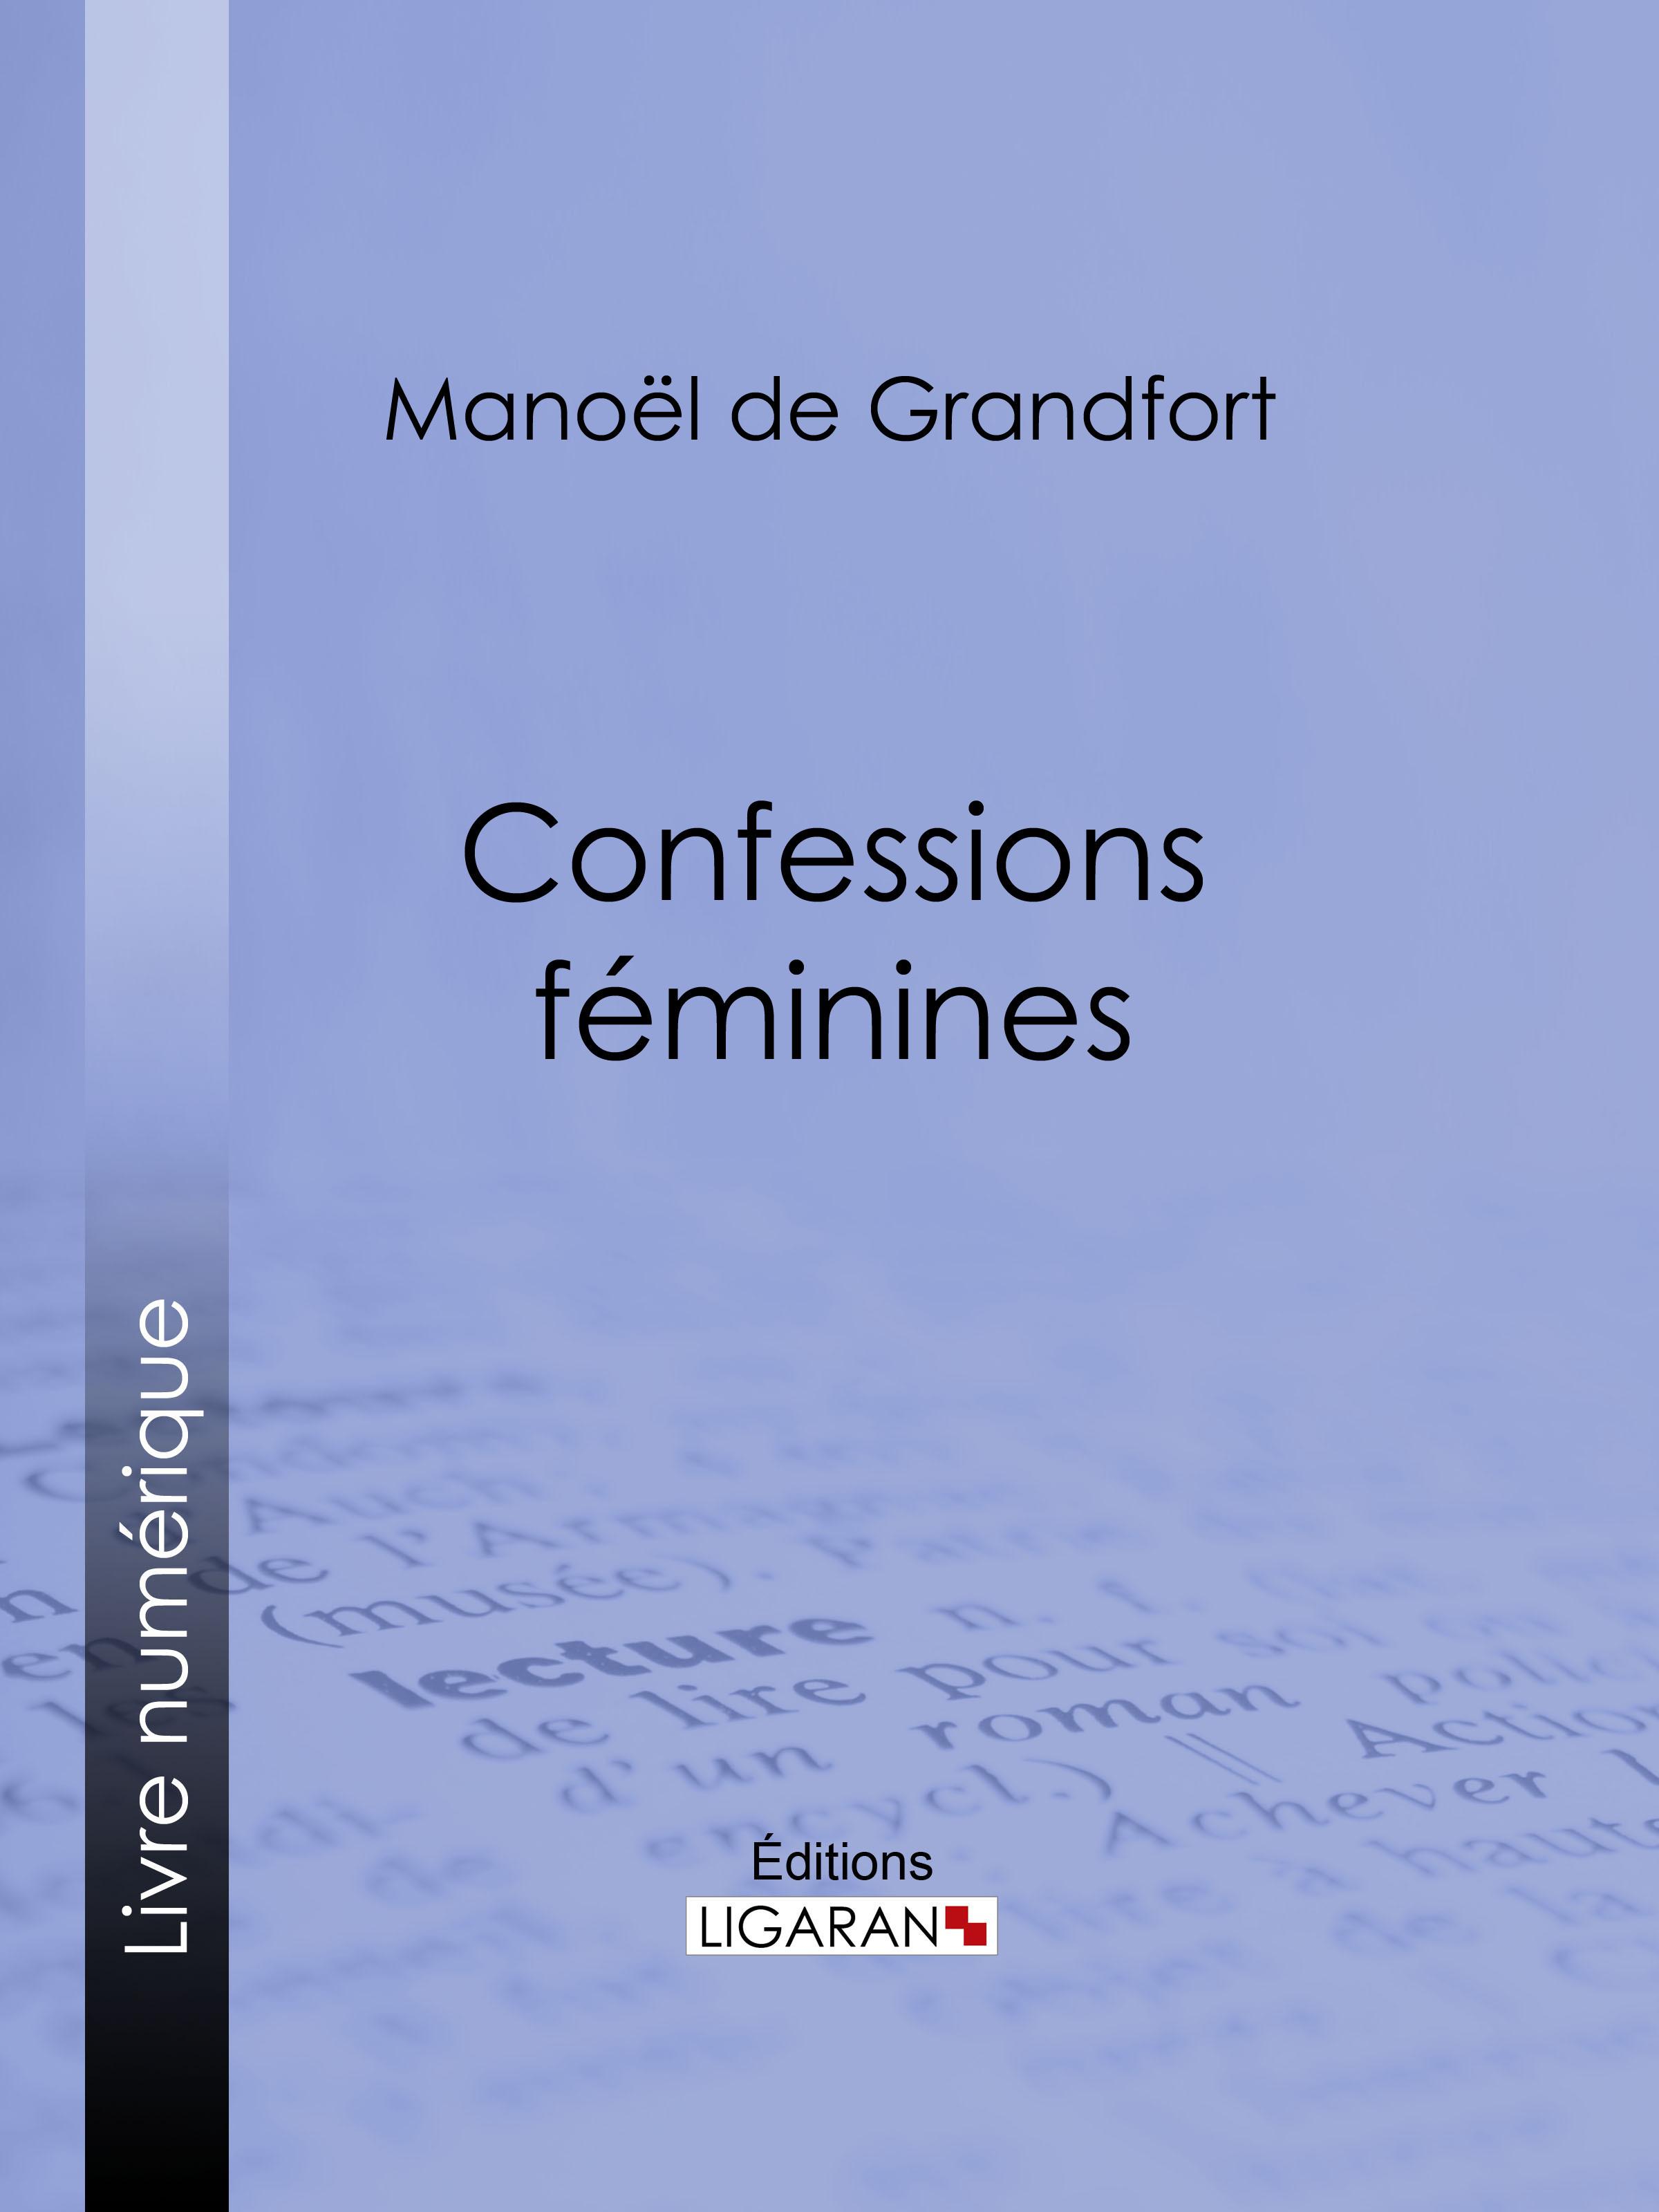 Confessions féminines